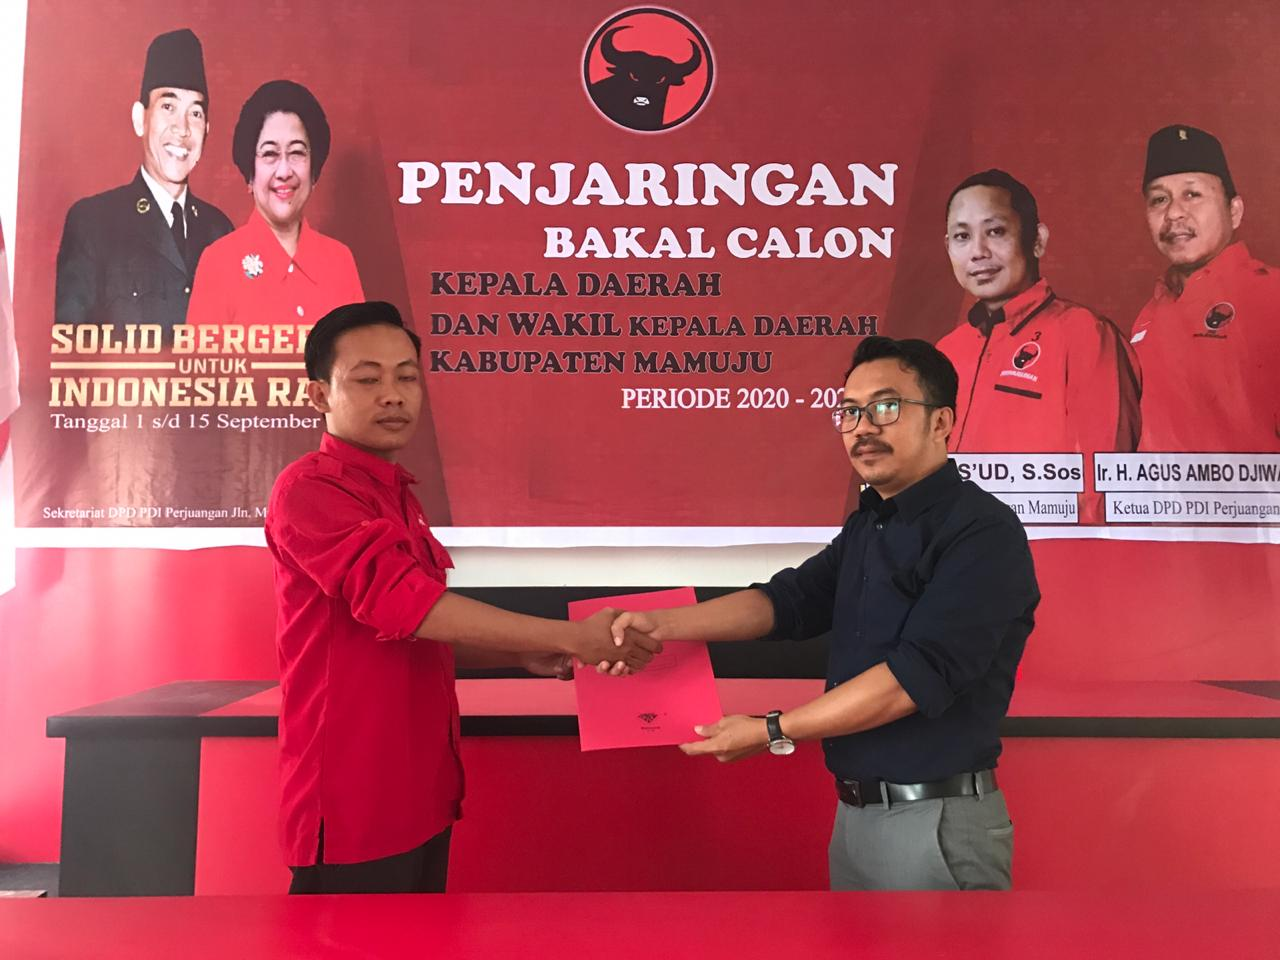 img Setelah PDI Perjuangan, Nama Sutinah Segera Diusung Ke DPP Demokrat